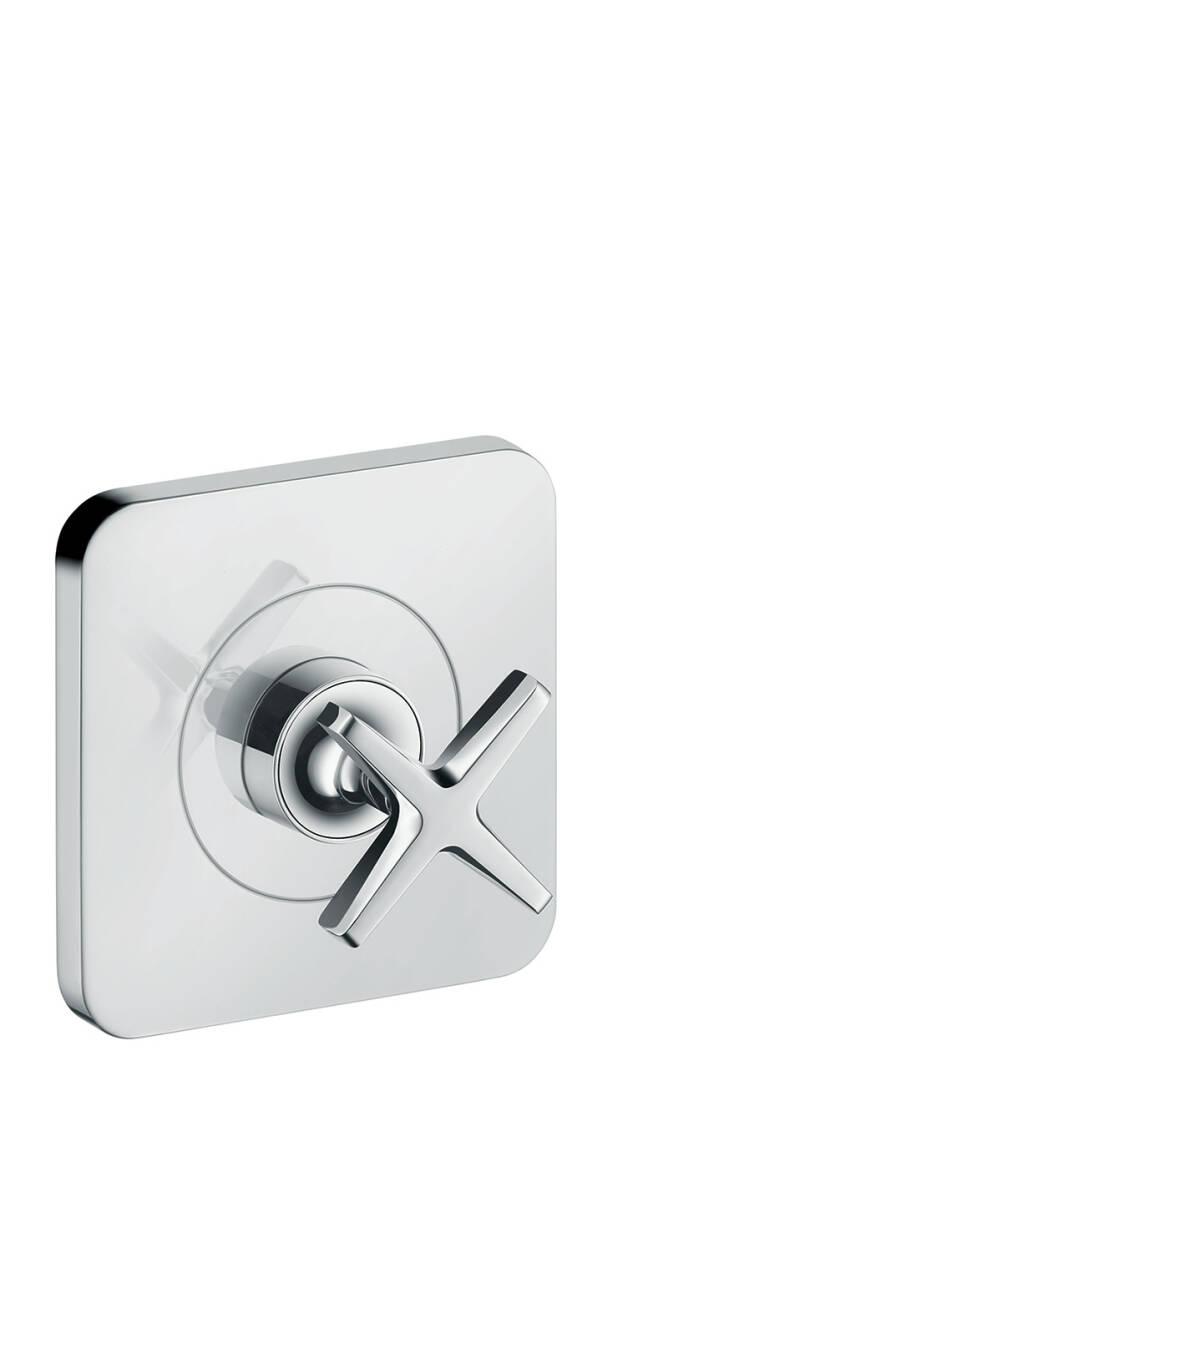 Shut-off valve 120/120 for concealed installation, Brushed Chrome, 36771260